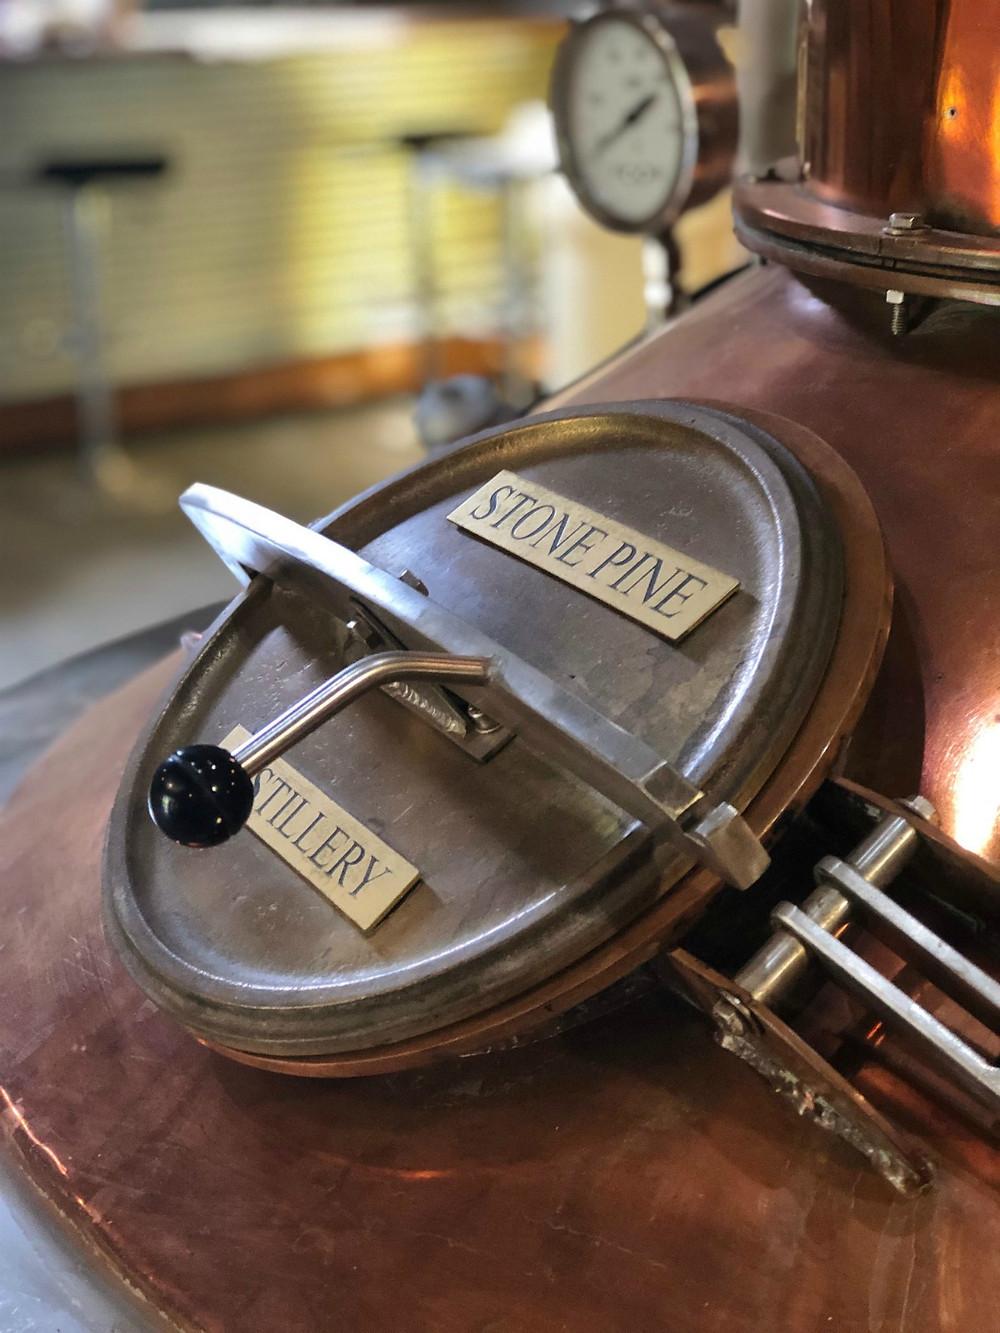 Stone Pine Distillery - Orange Blossom Gin